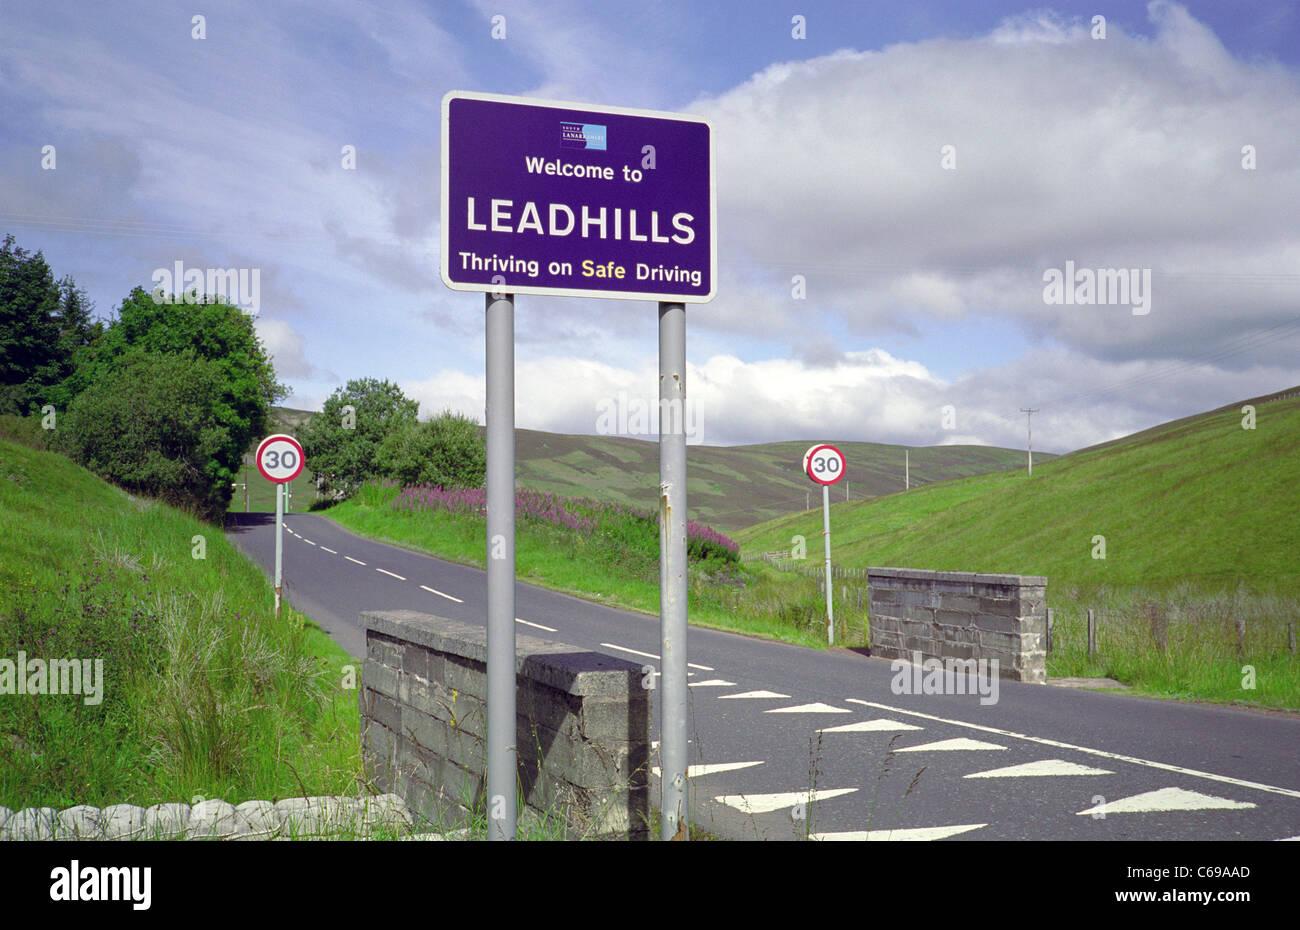 Entrance Sign to the Village of Leadhills, South Lanarkshire, Scotland, UK - Stock Image